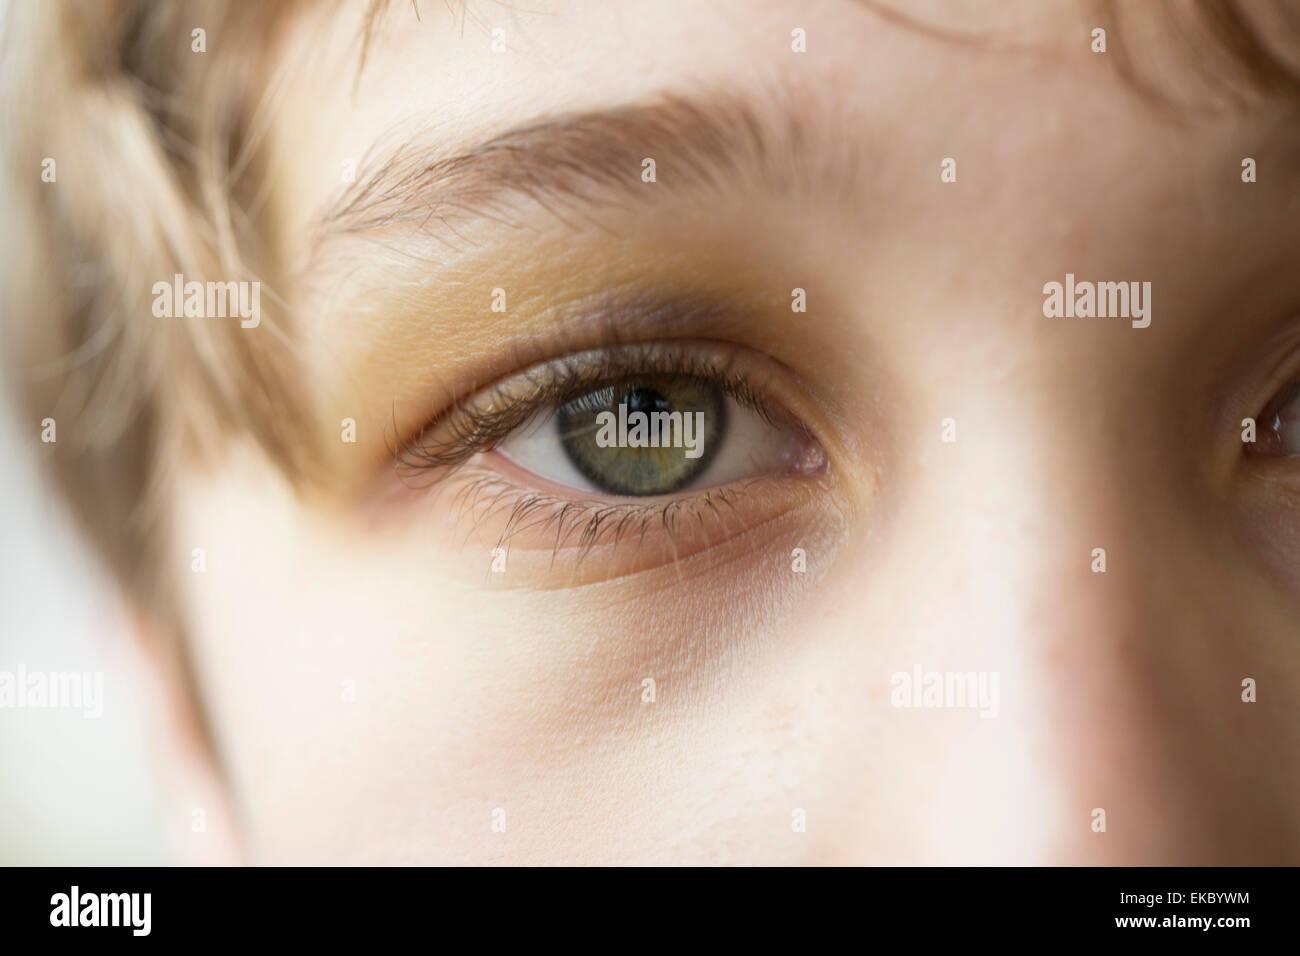 Close up boy's eye Immagini Stock